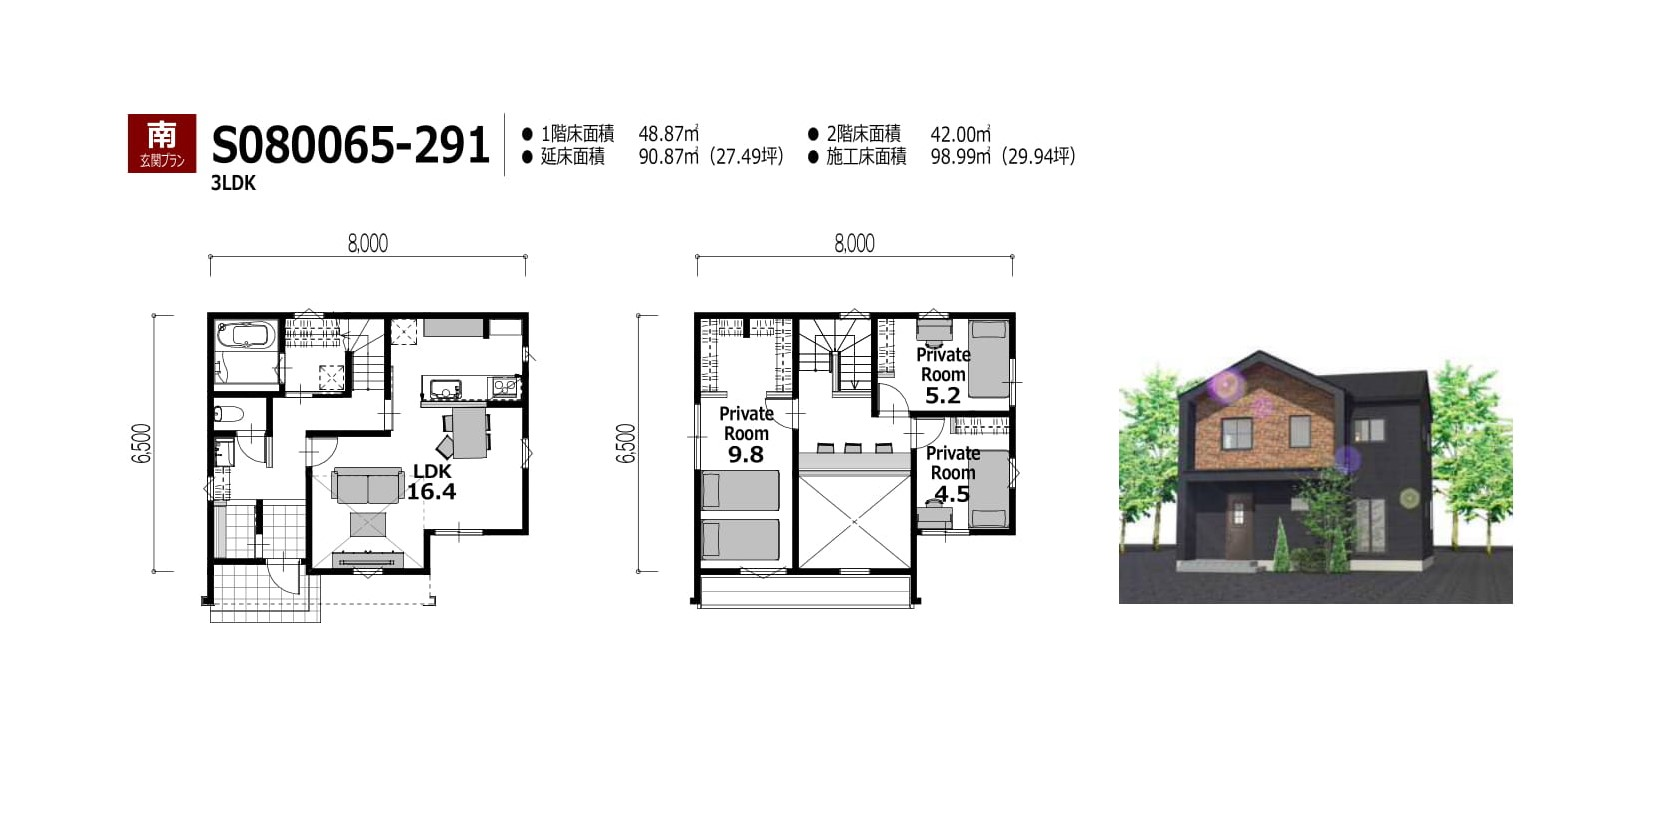 COZYHOUSE・廝rooklyn-1